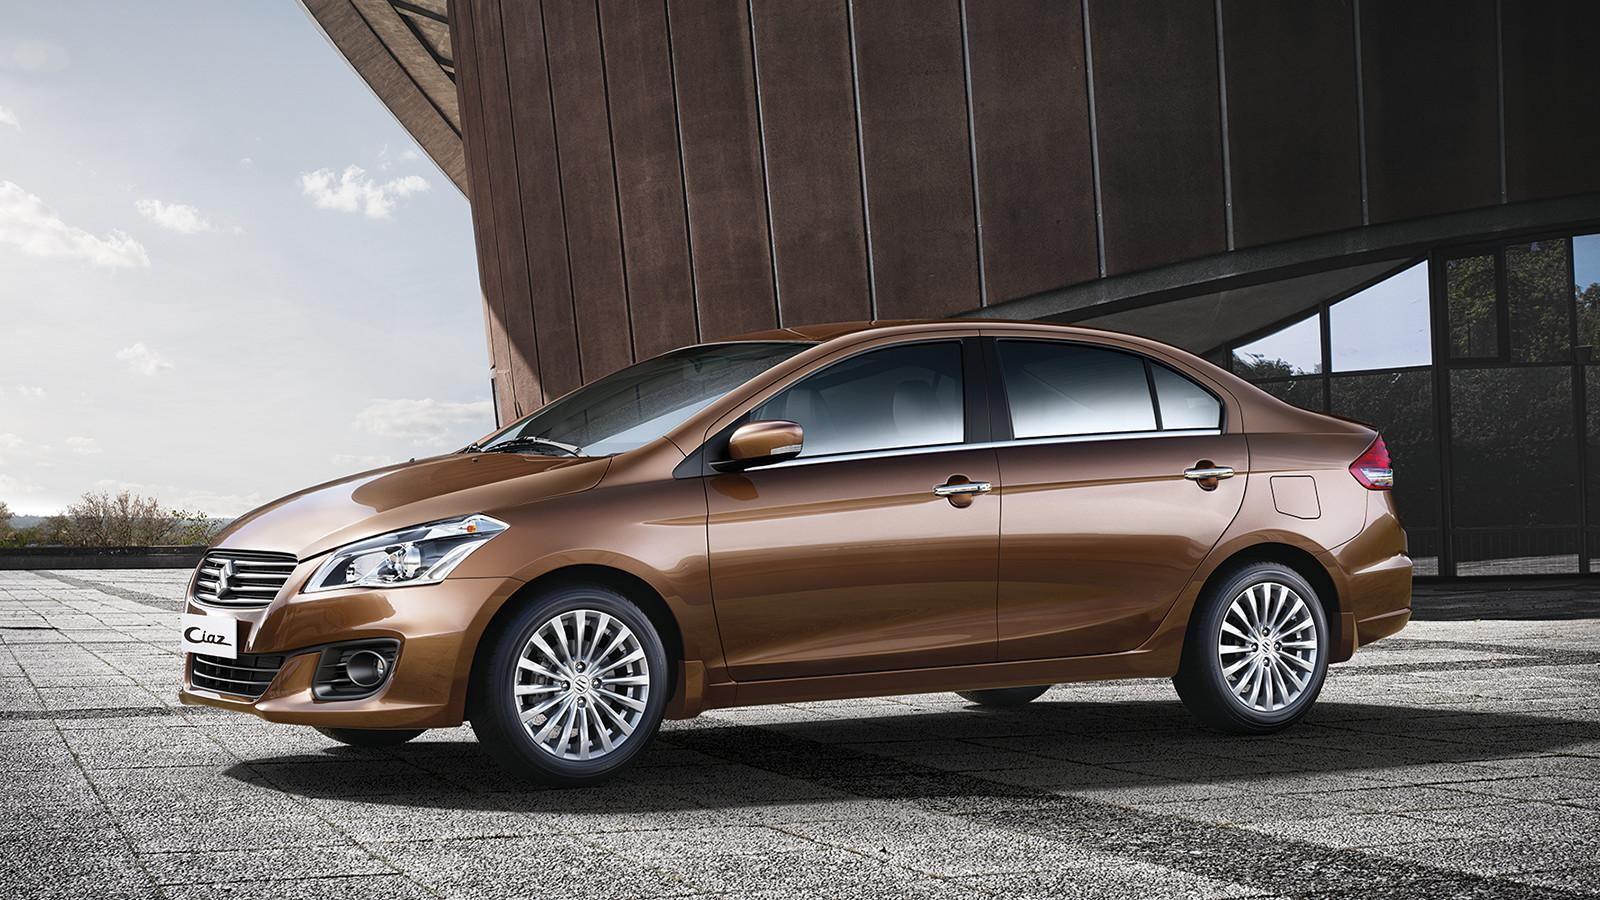 Car Pictures List for Suzuki Ciaz 2017 Standard (UAE ...